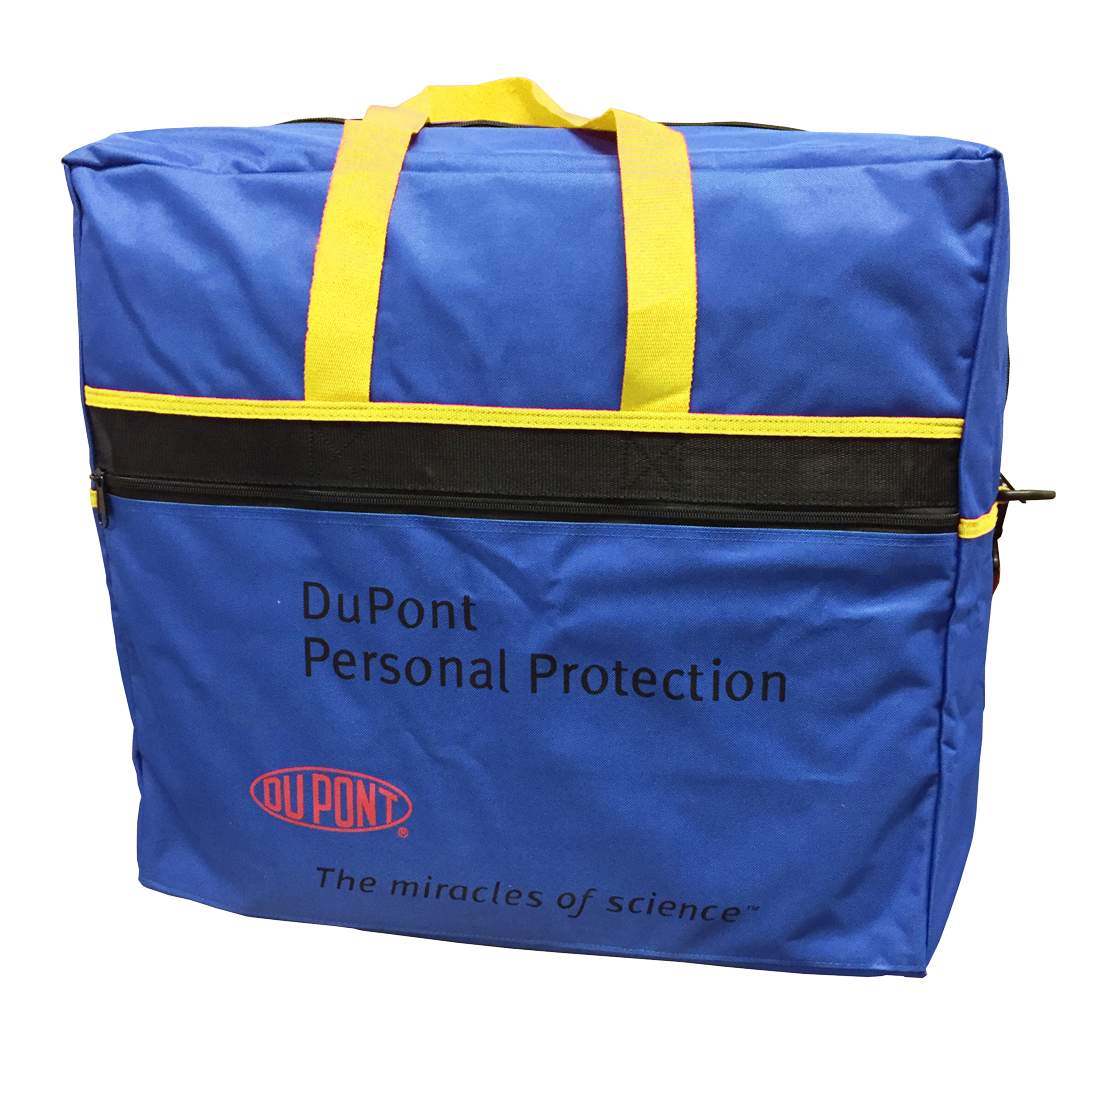 DuPont Level A HazMat Training Suit Storage Bag image